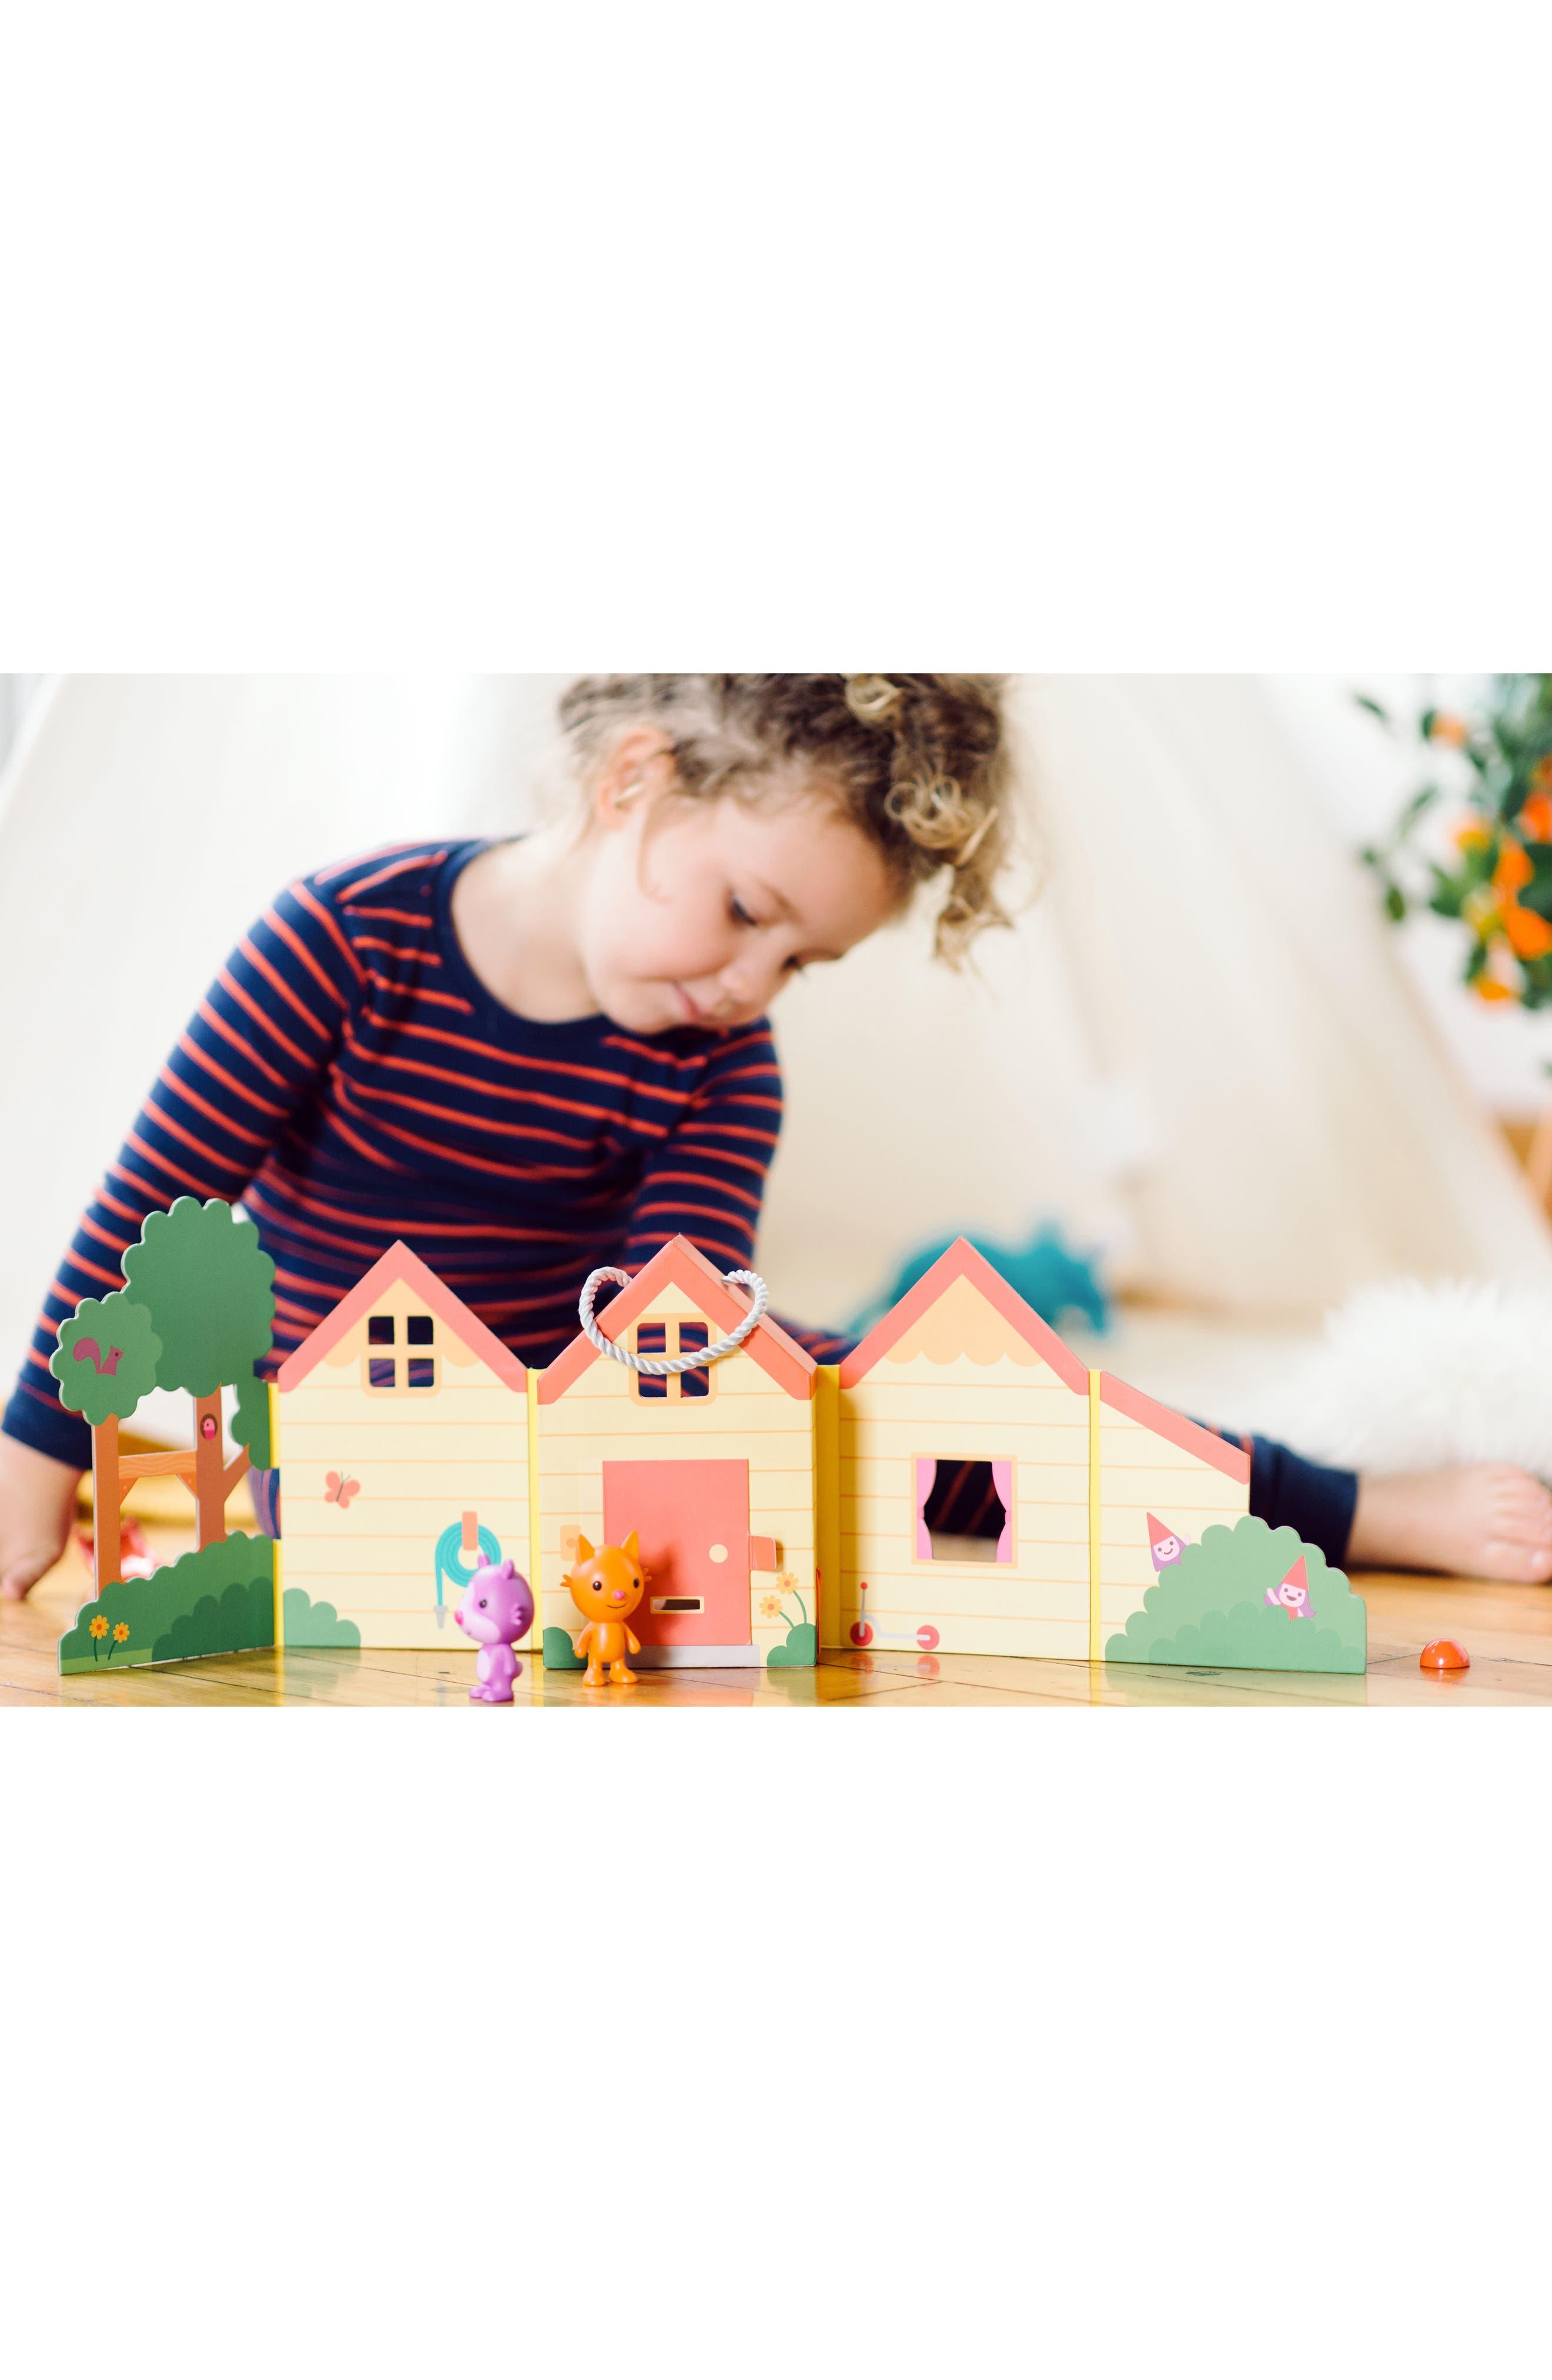 Jinja's House Portable Play Set,                             Alternate thumbnail 5, color,                             800